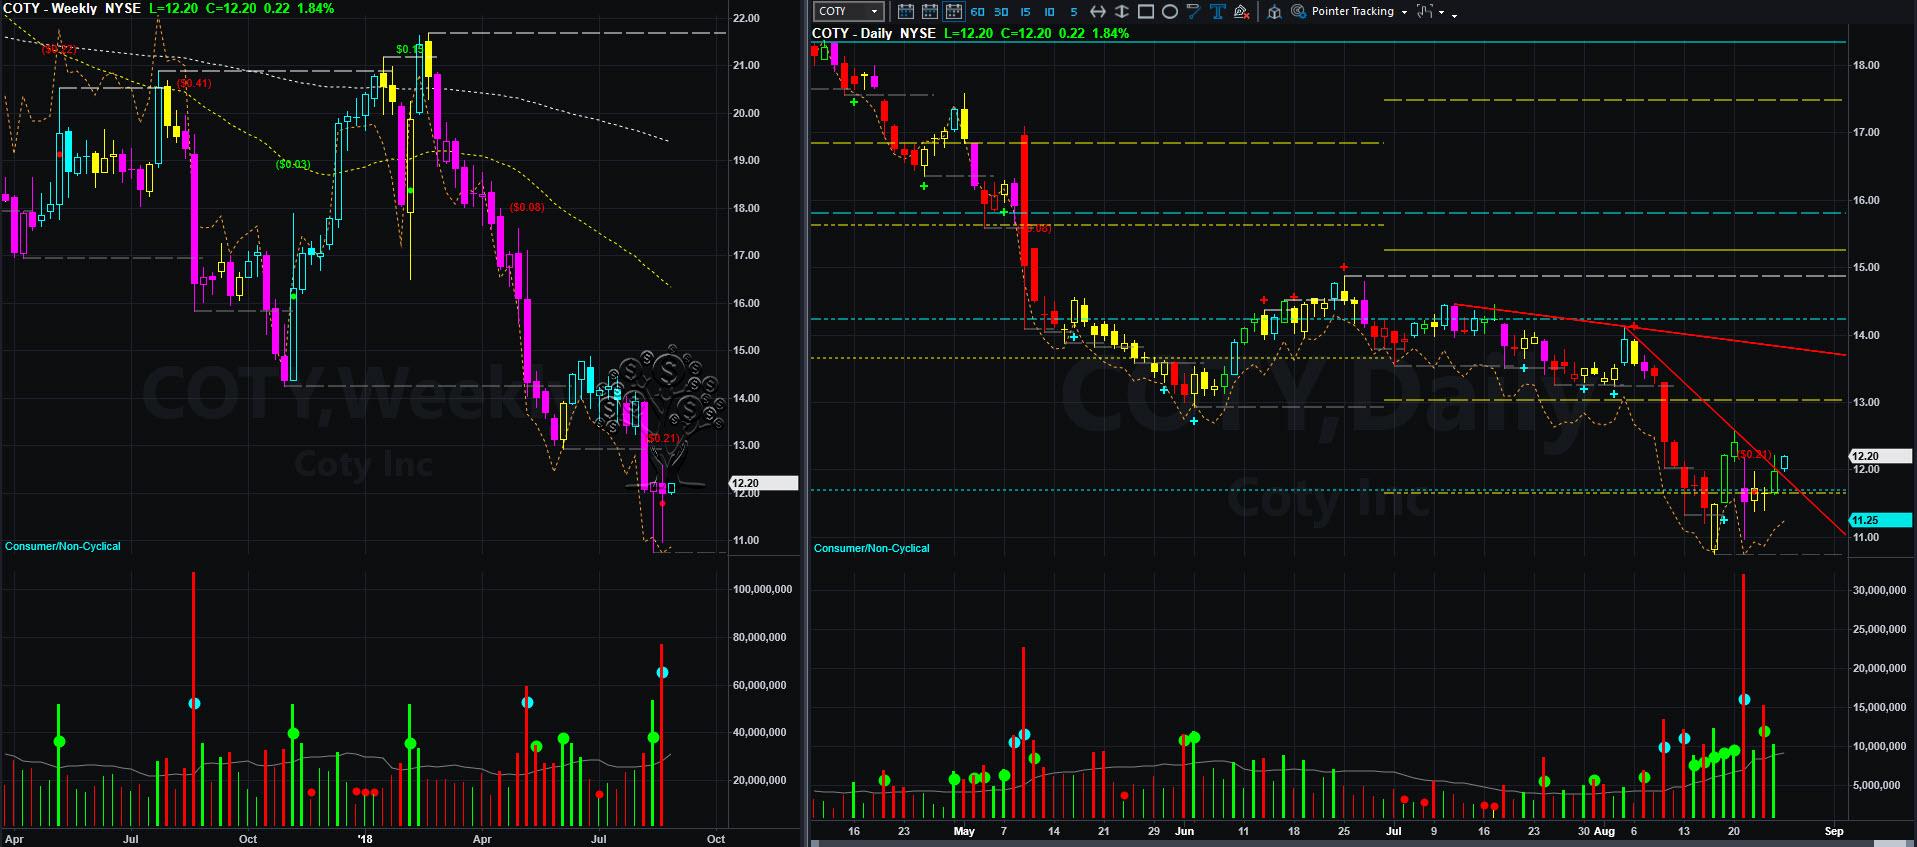 coty chart 2018-08-27_10-00-48.jpg